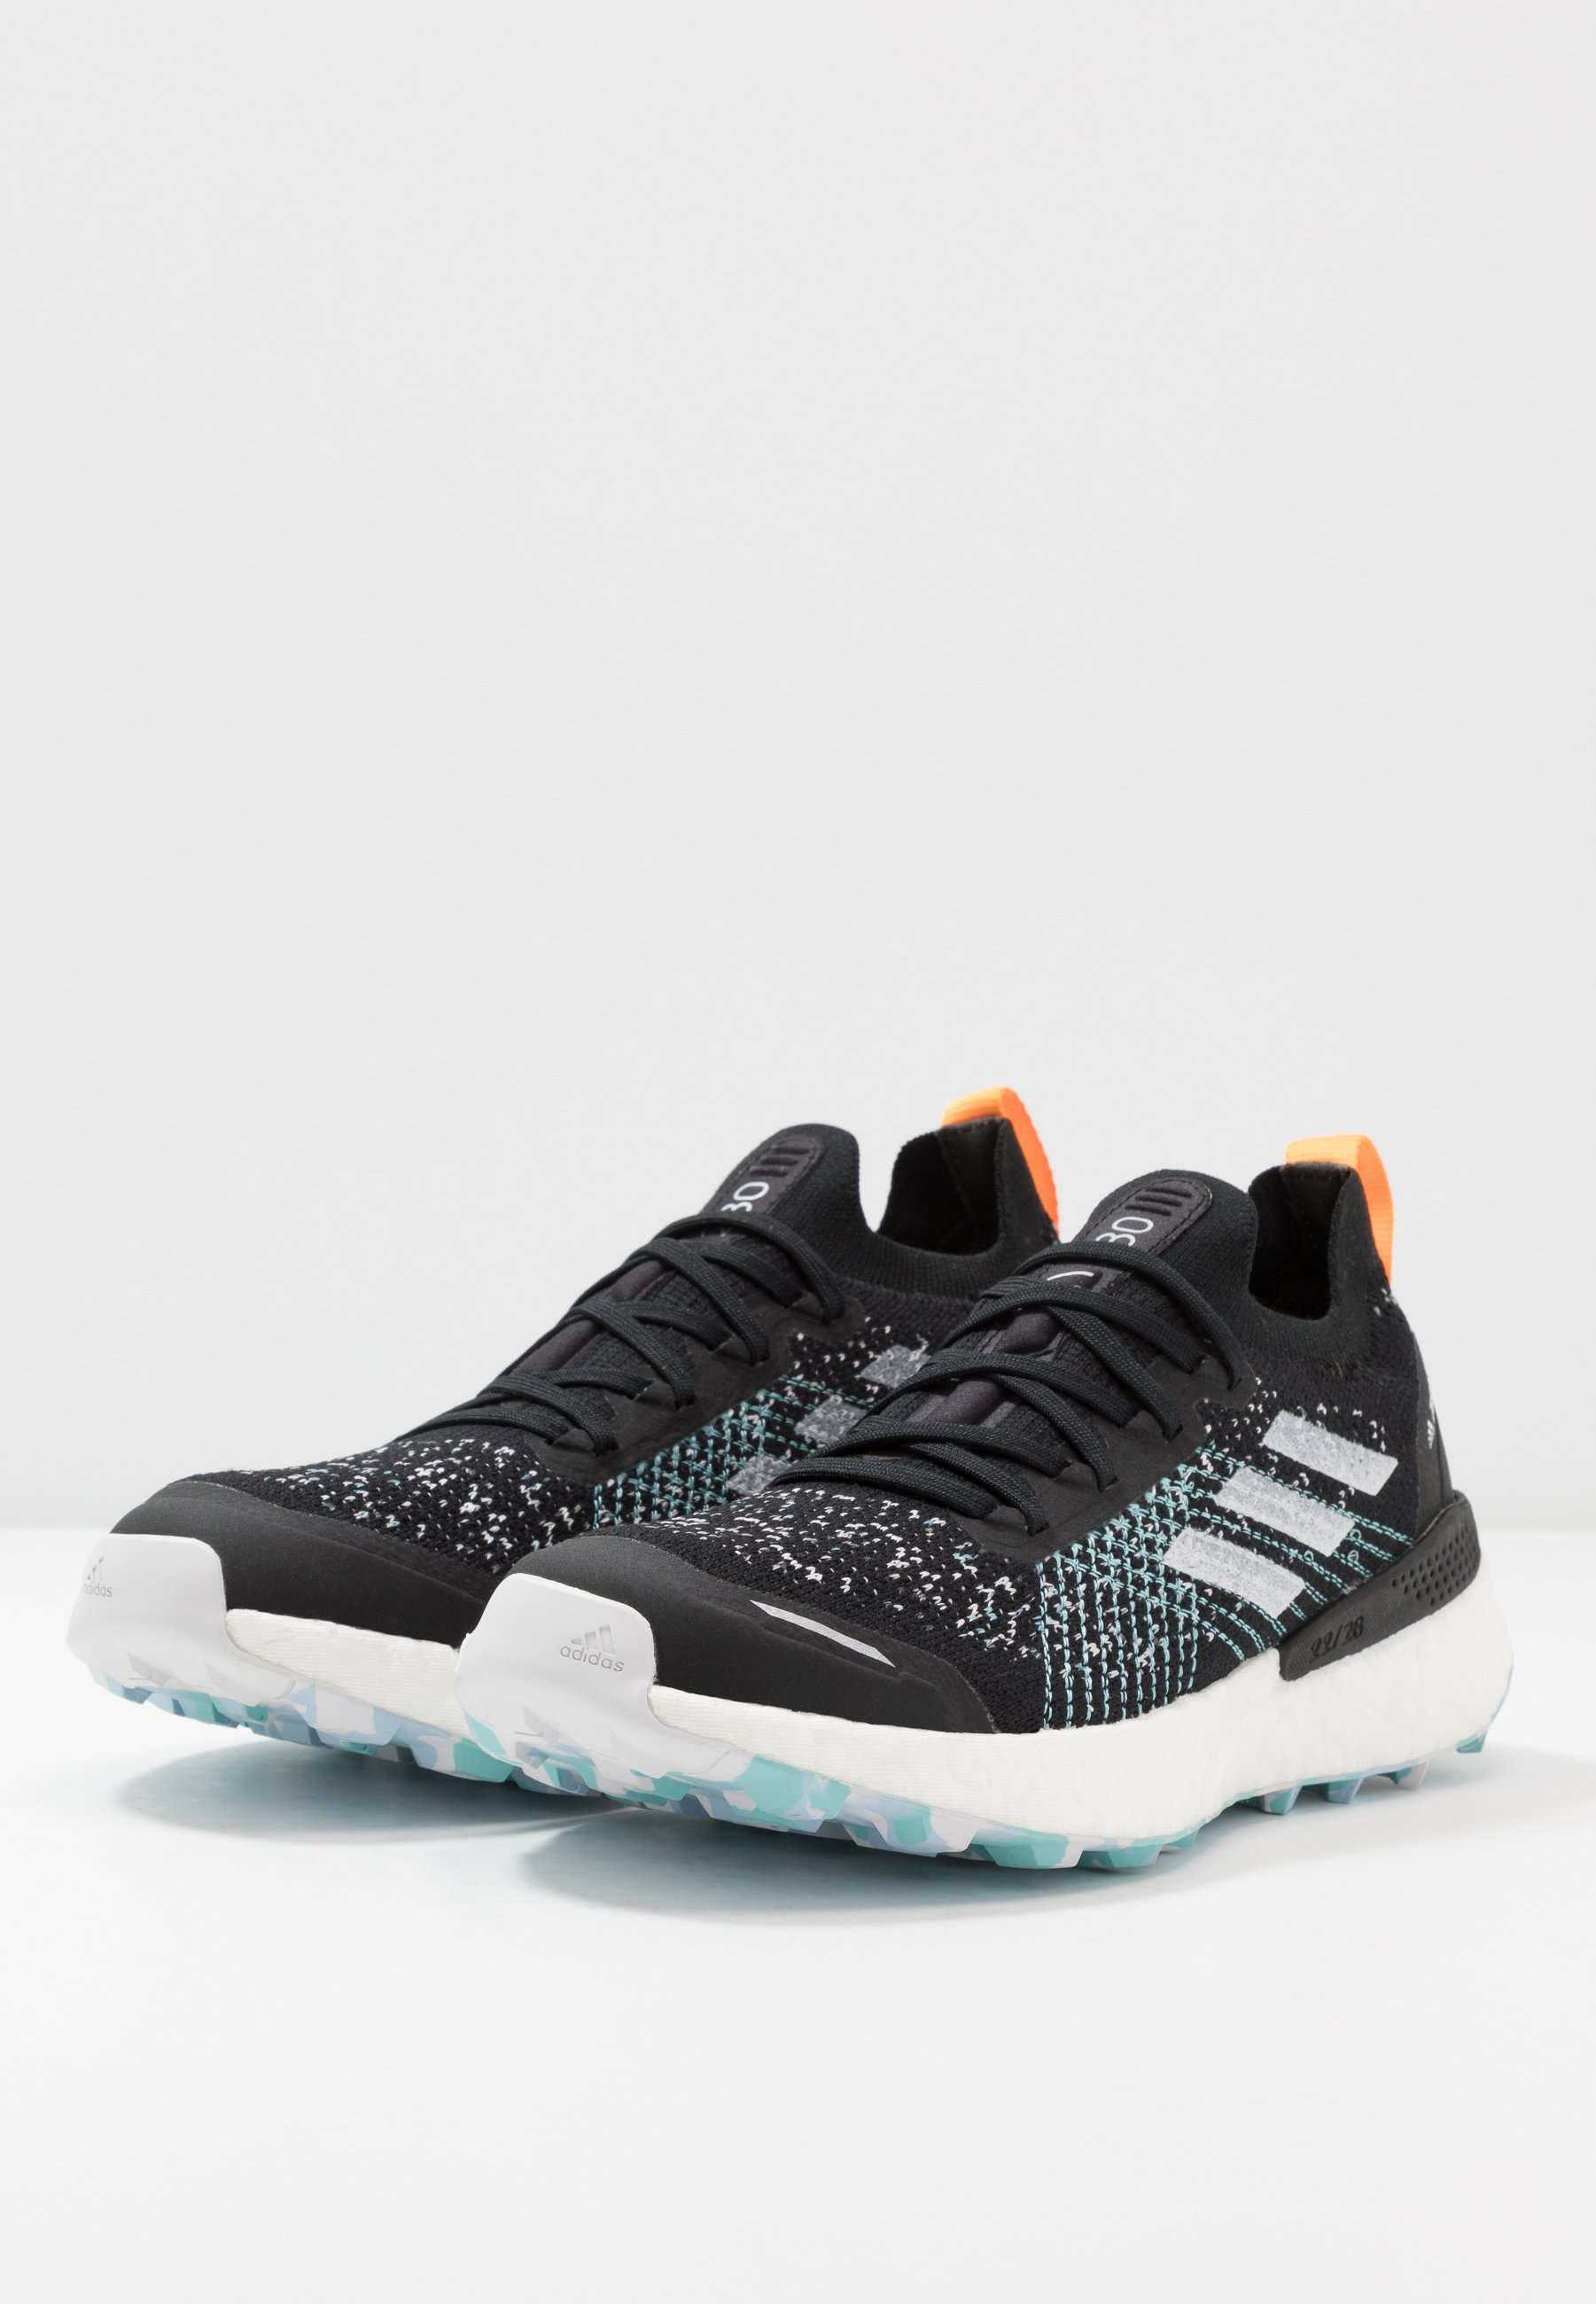 adidas Performance TERREX TWO ULTRA PARLEY - Scarpe da trail running - core black/dash grey/blue spirit k08l6F3Z